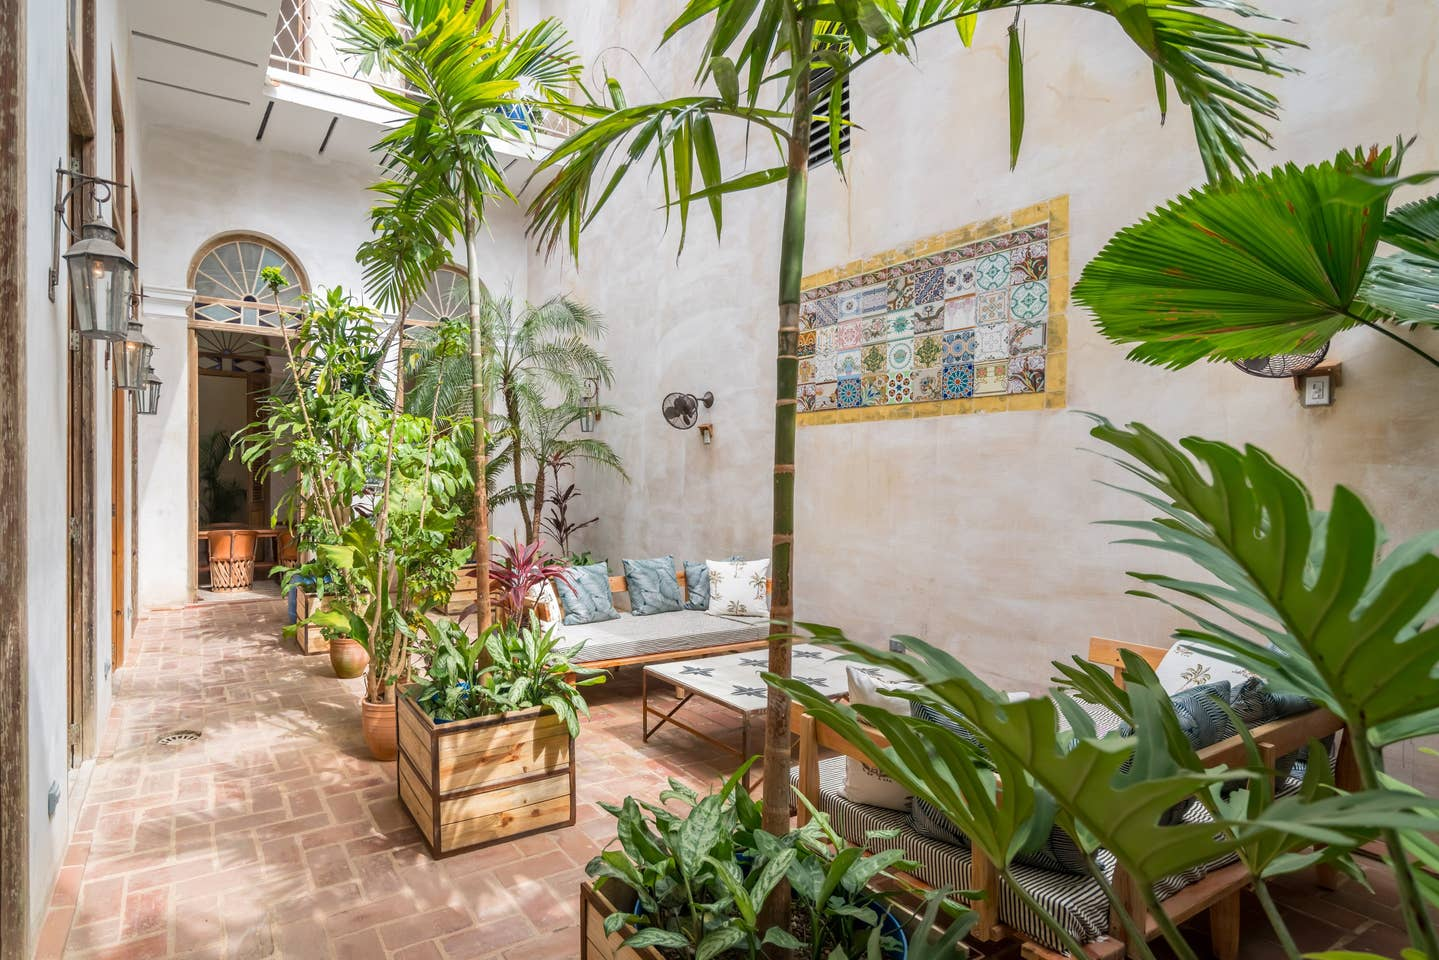 airbnb 13.jpg